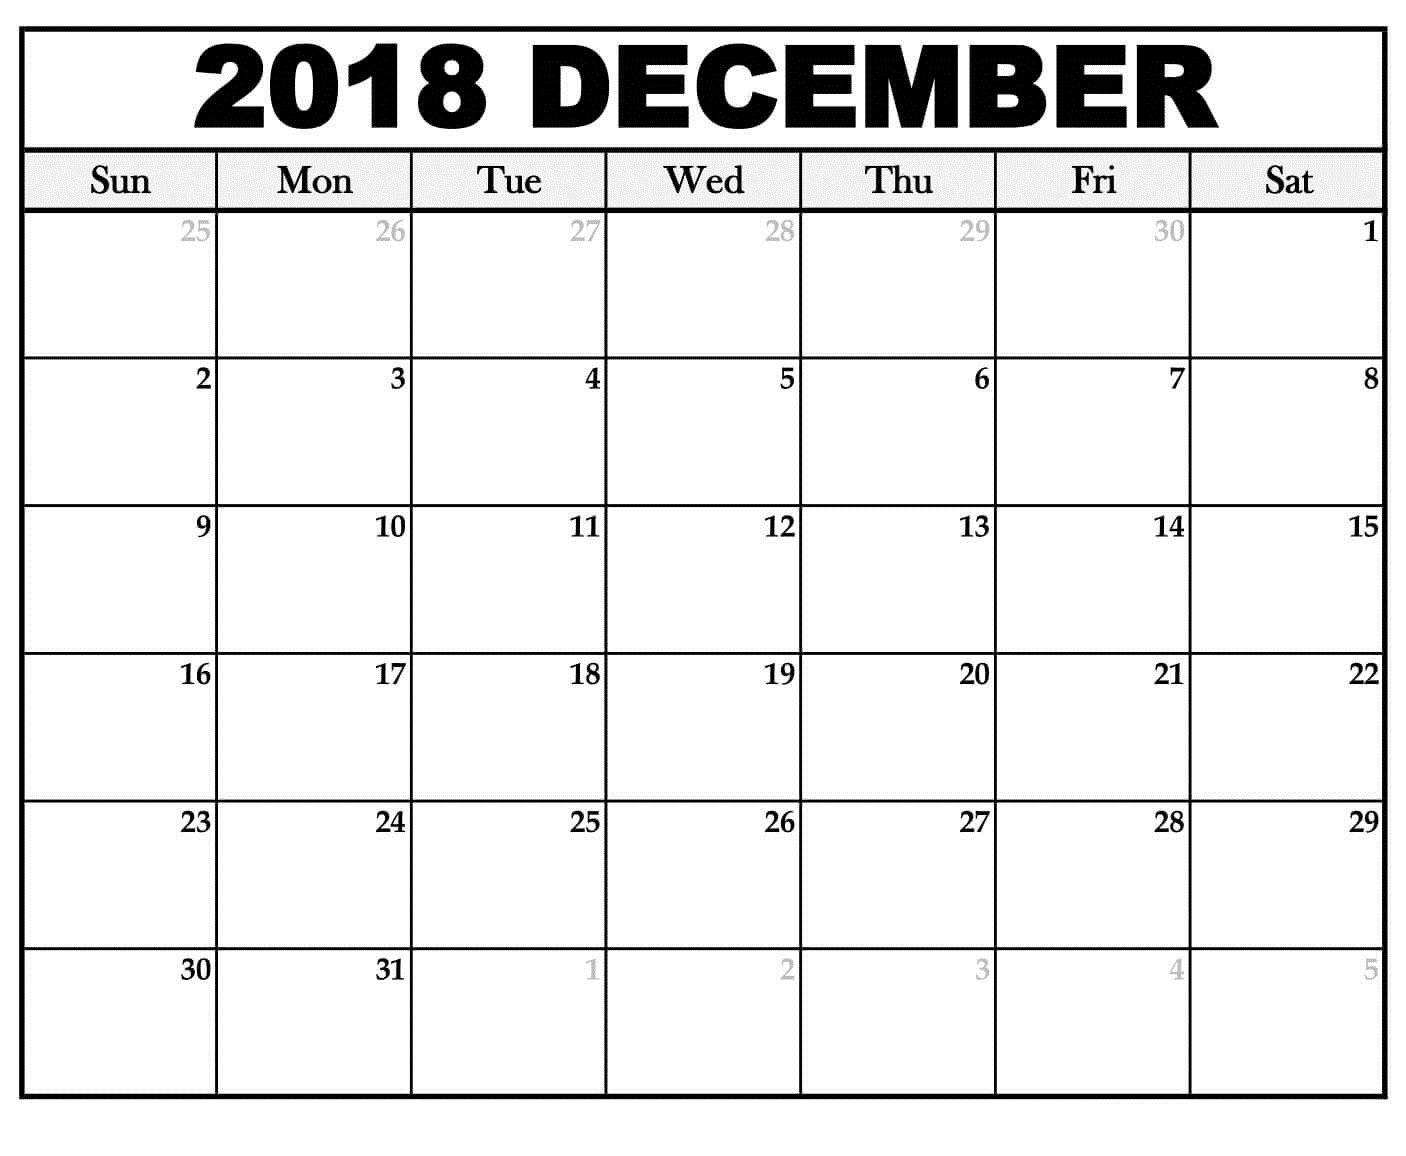 Calendar December 2018 Editable Template | Printable Calendar for December Calendar Printable Template